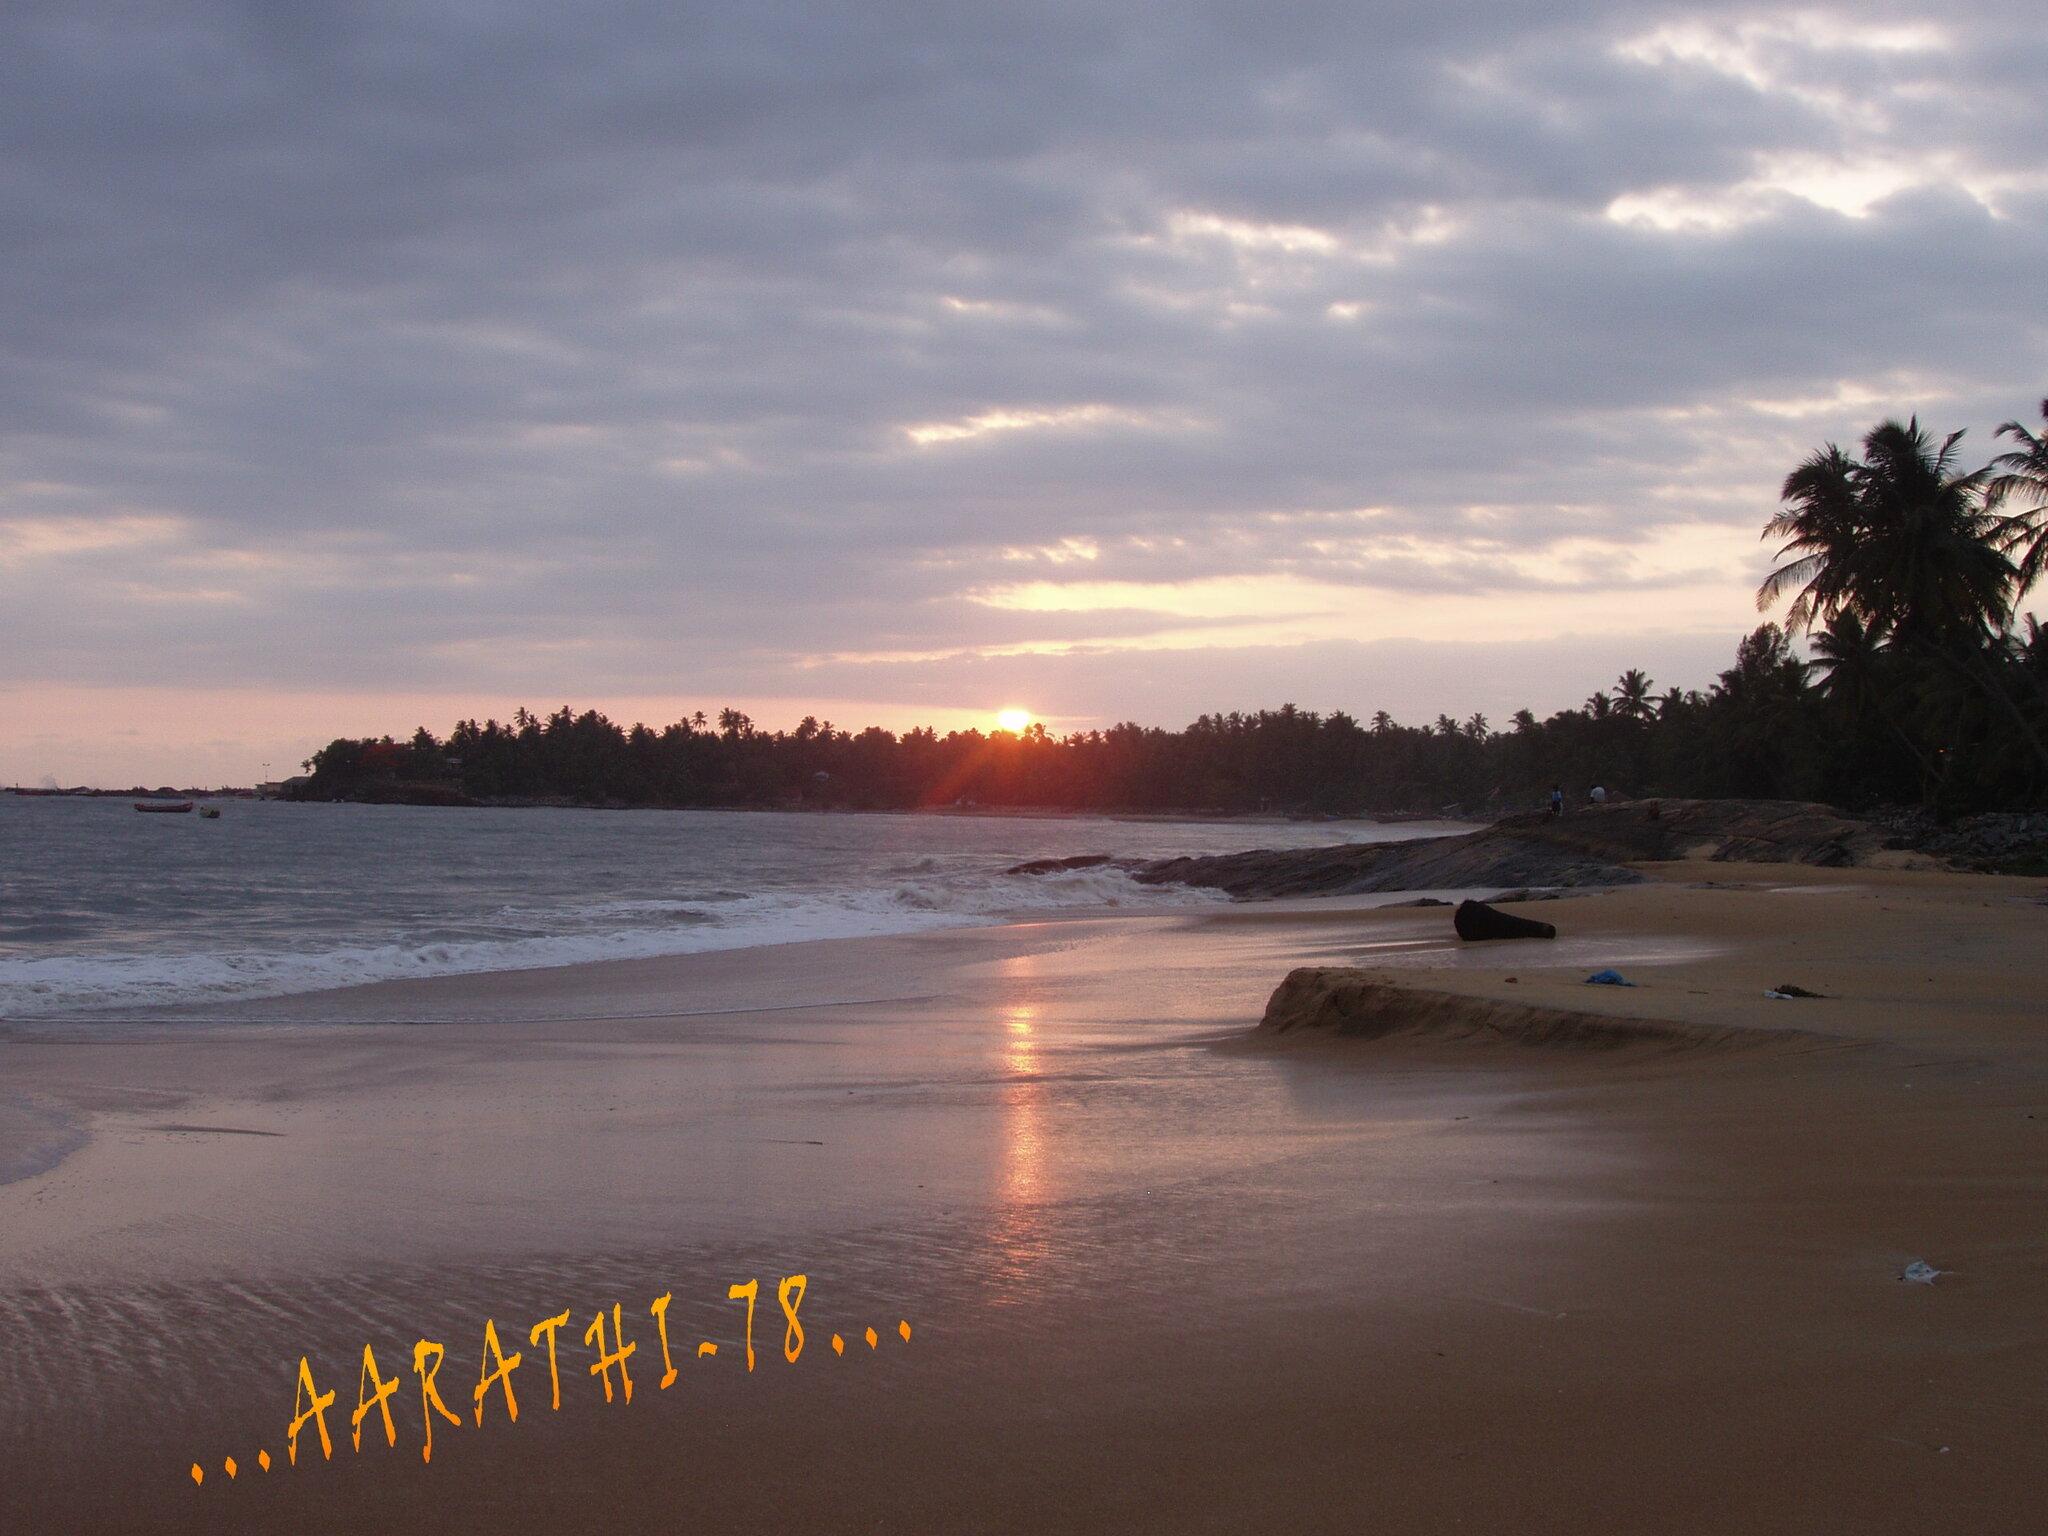 Sunset @ Thalayyi Beach - Tellicherry